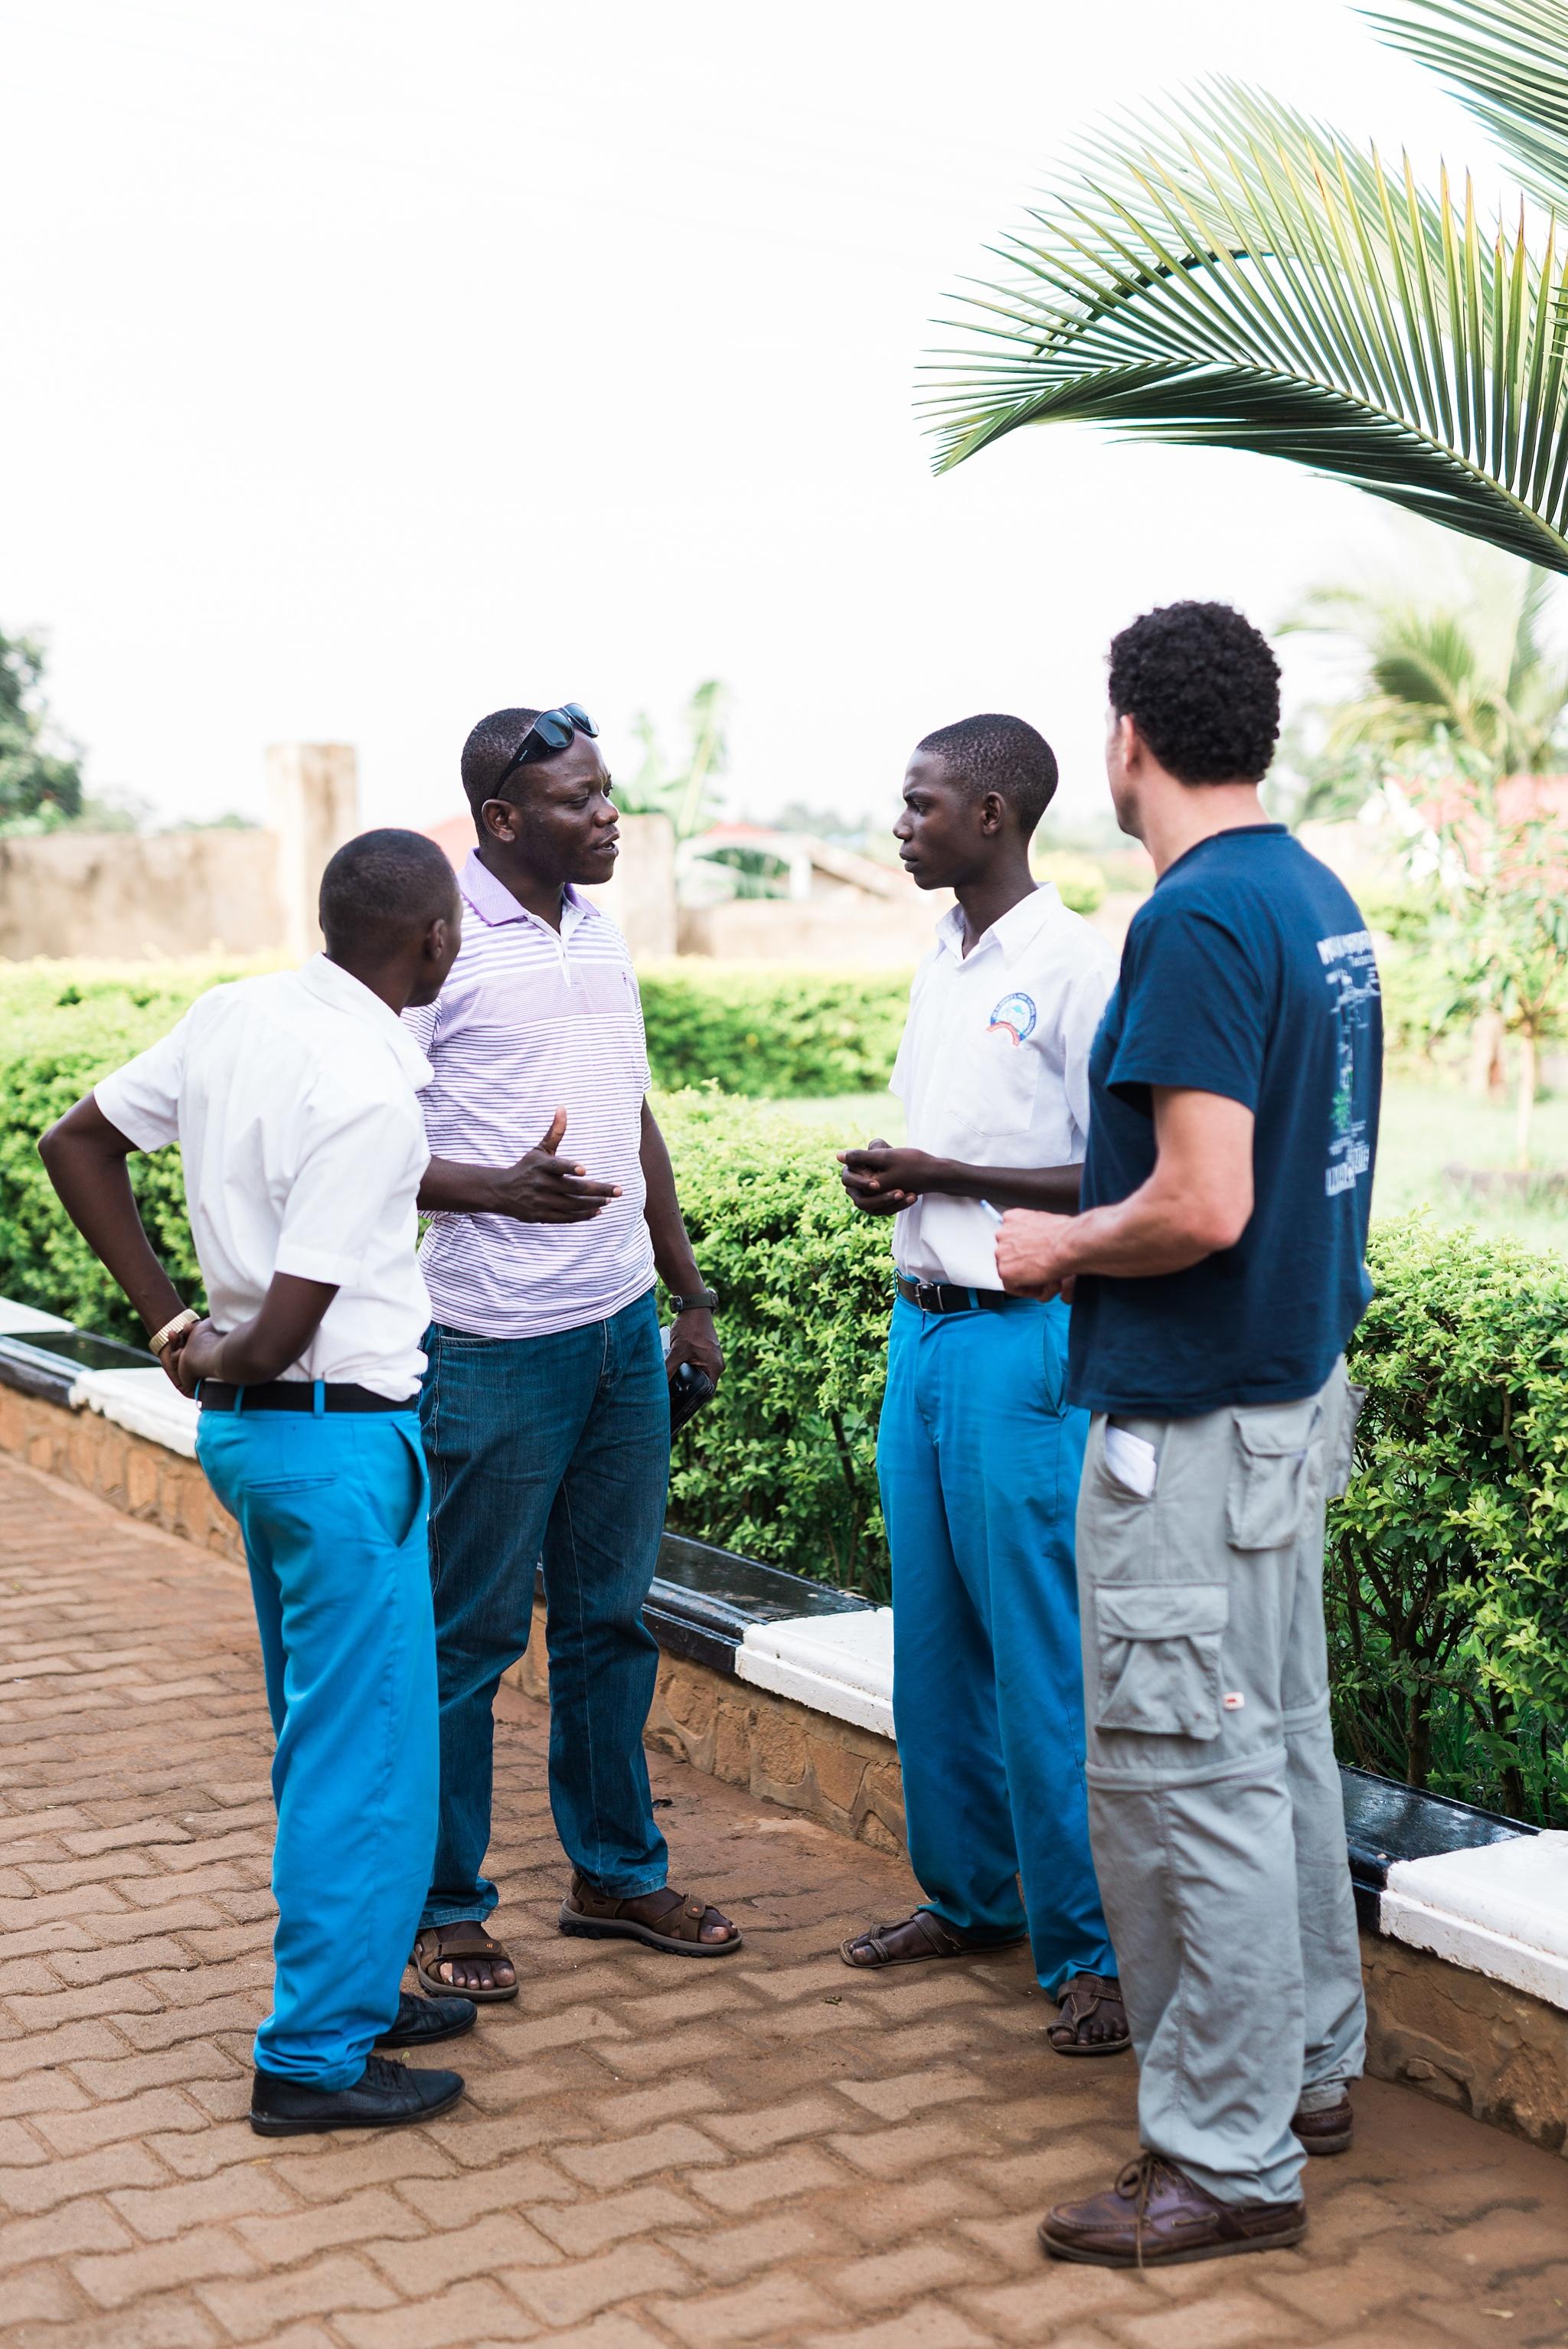 destination-photographer-uganda-graceforeducation-607.jpg